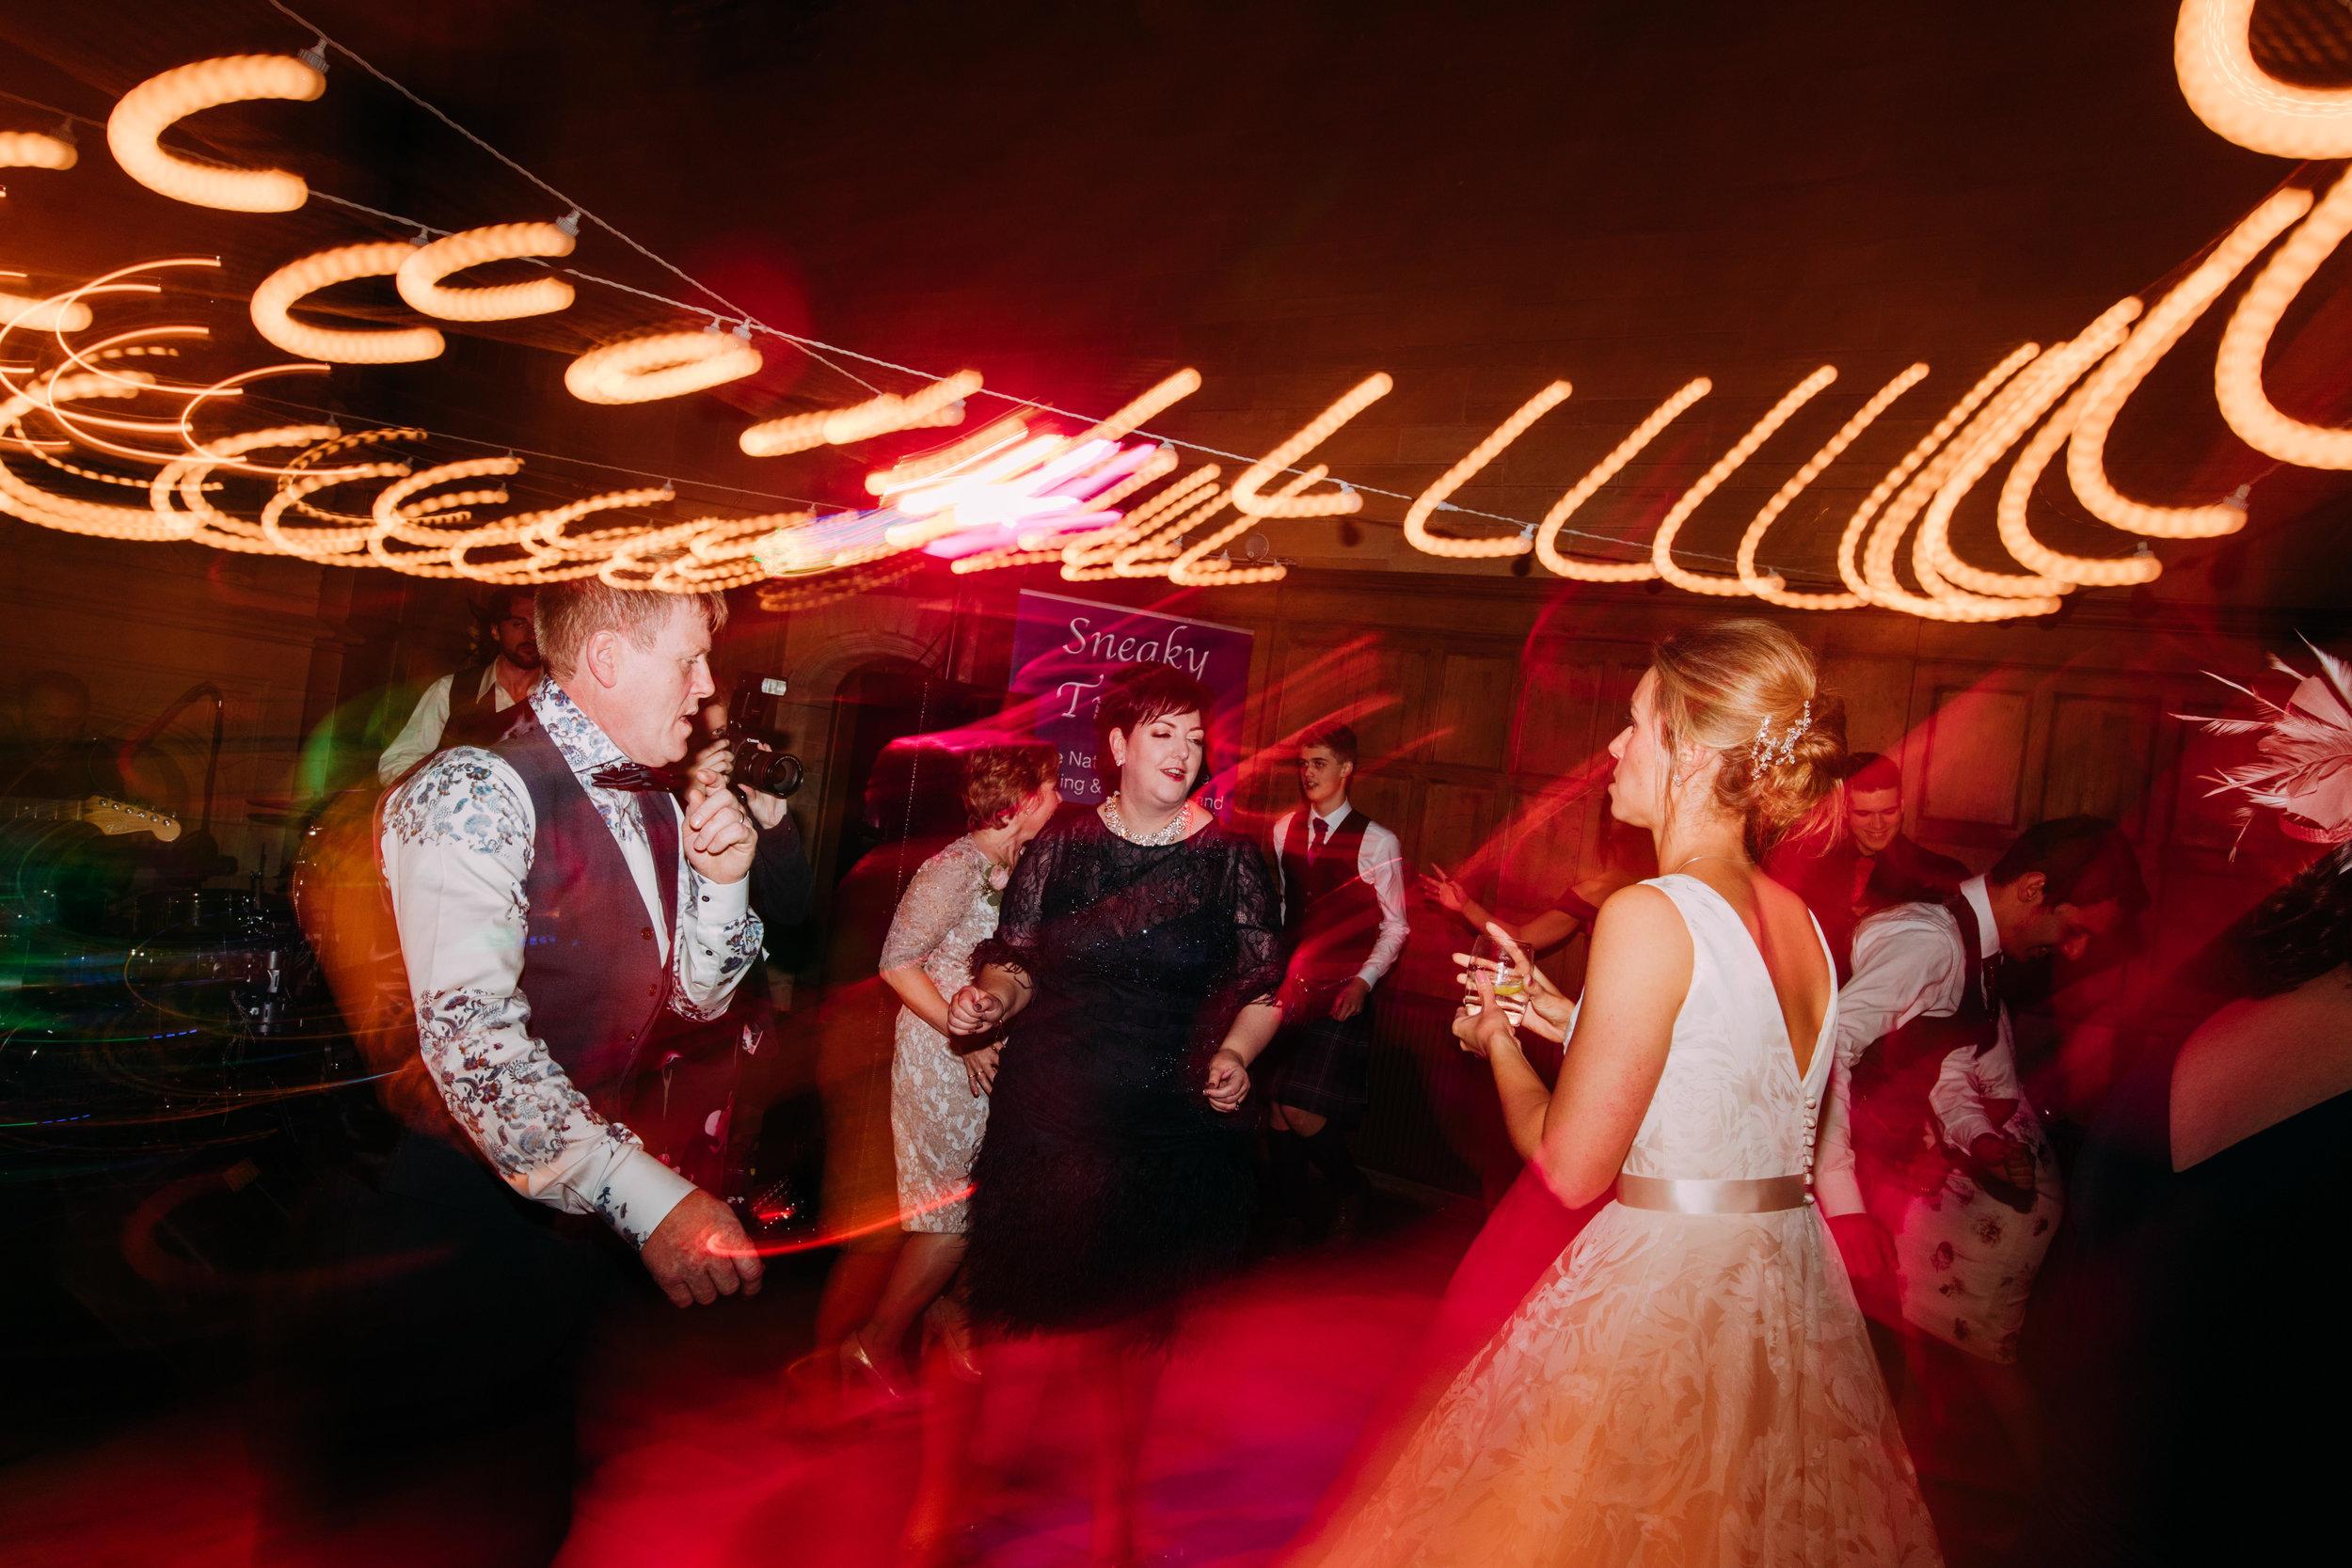 Karin_and_Shauns_Wedding_-_Achnagairn_Castle_-_www.eilidhrobertson.co.uk-1417.jpg